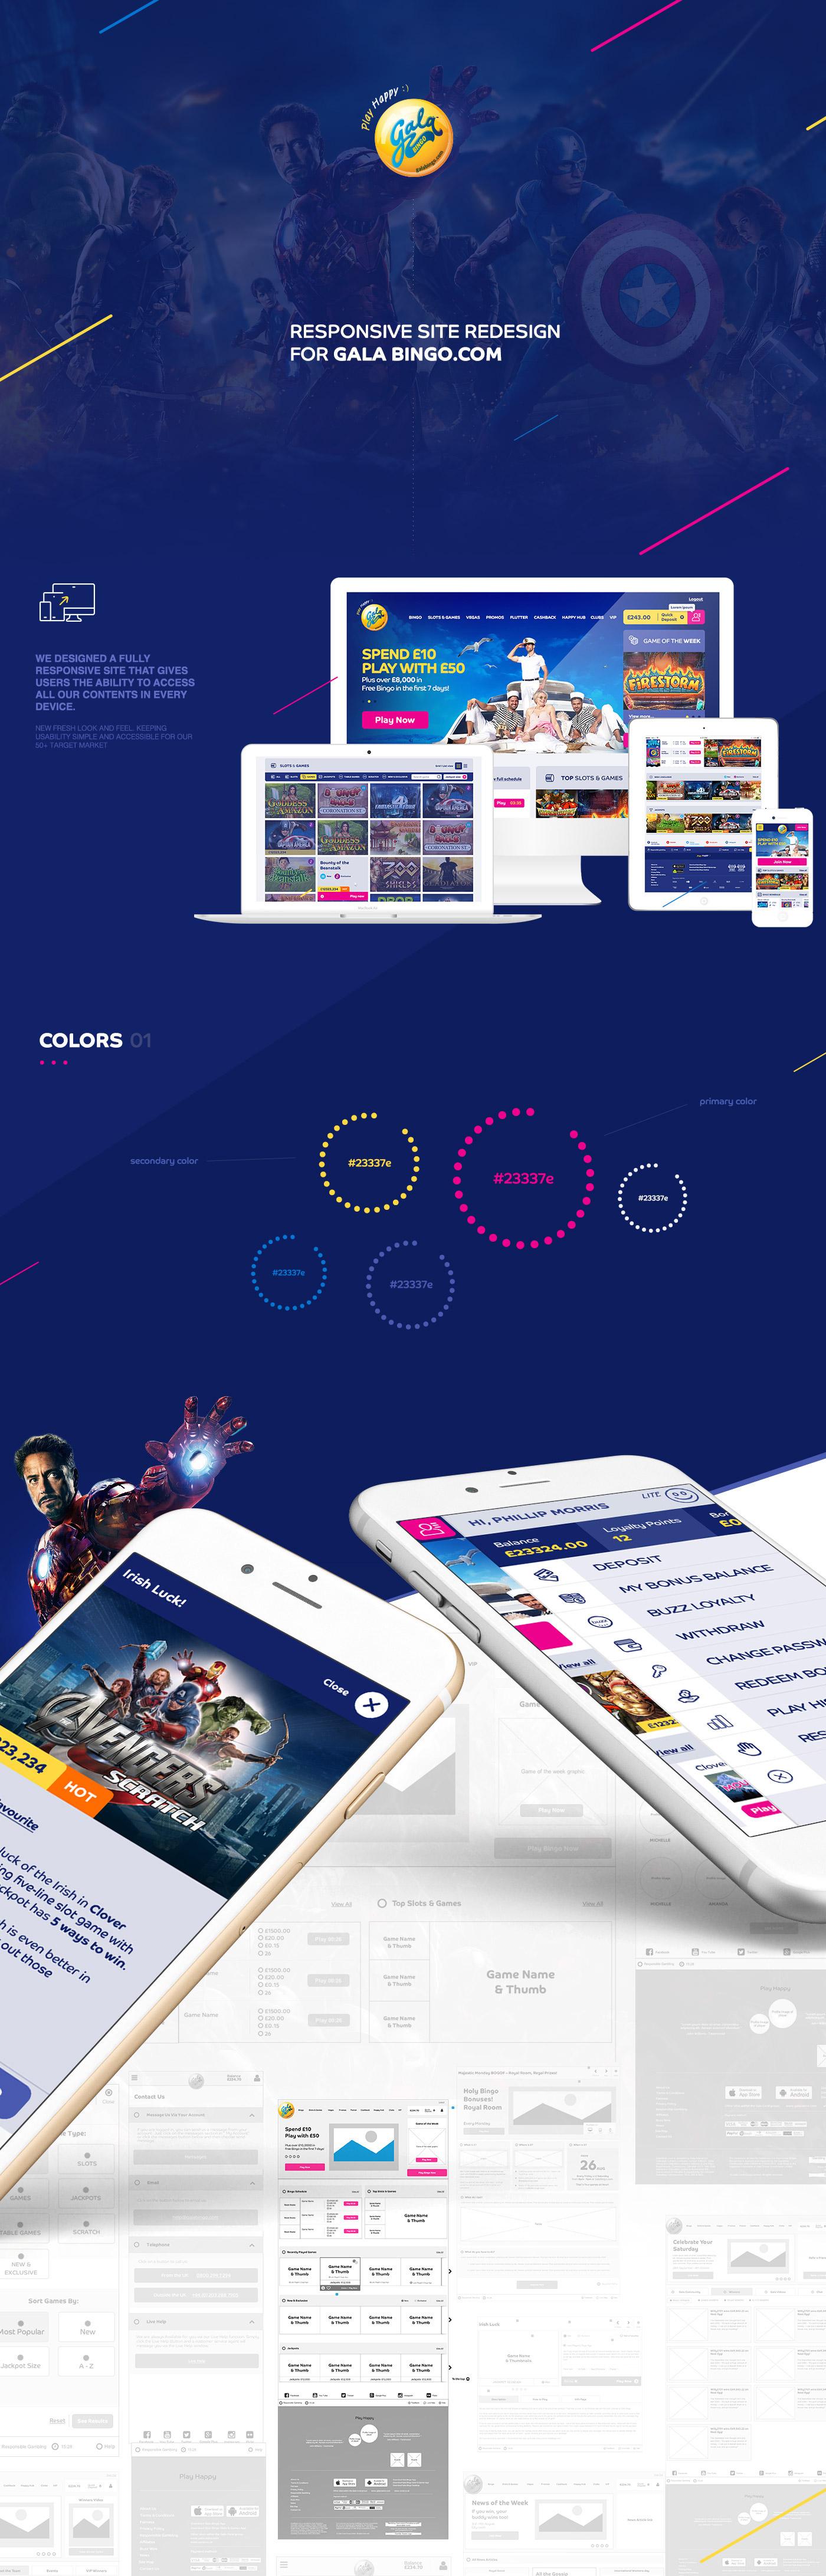 bingo casino Gaming Responsive eGaming clean modern app UI Interface